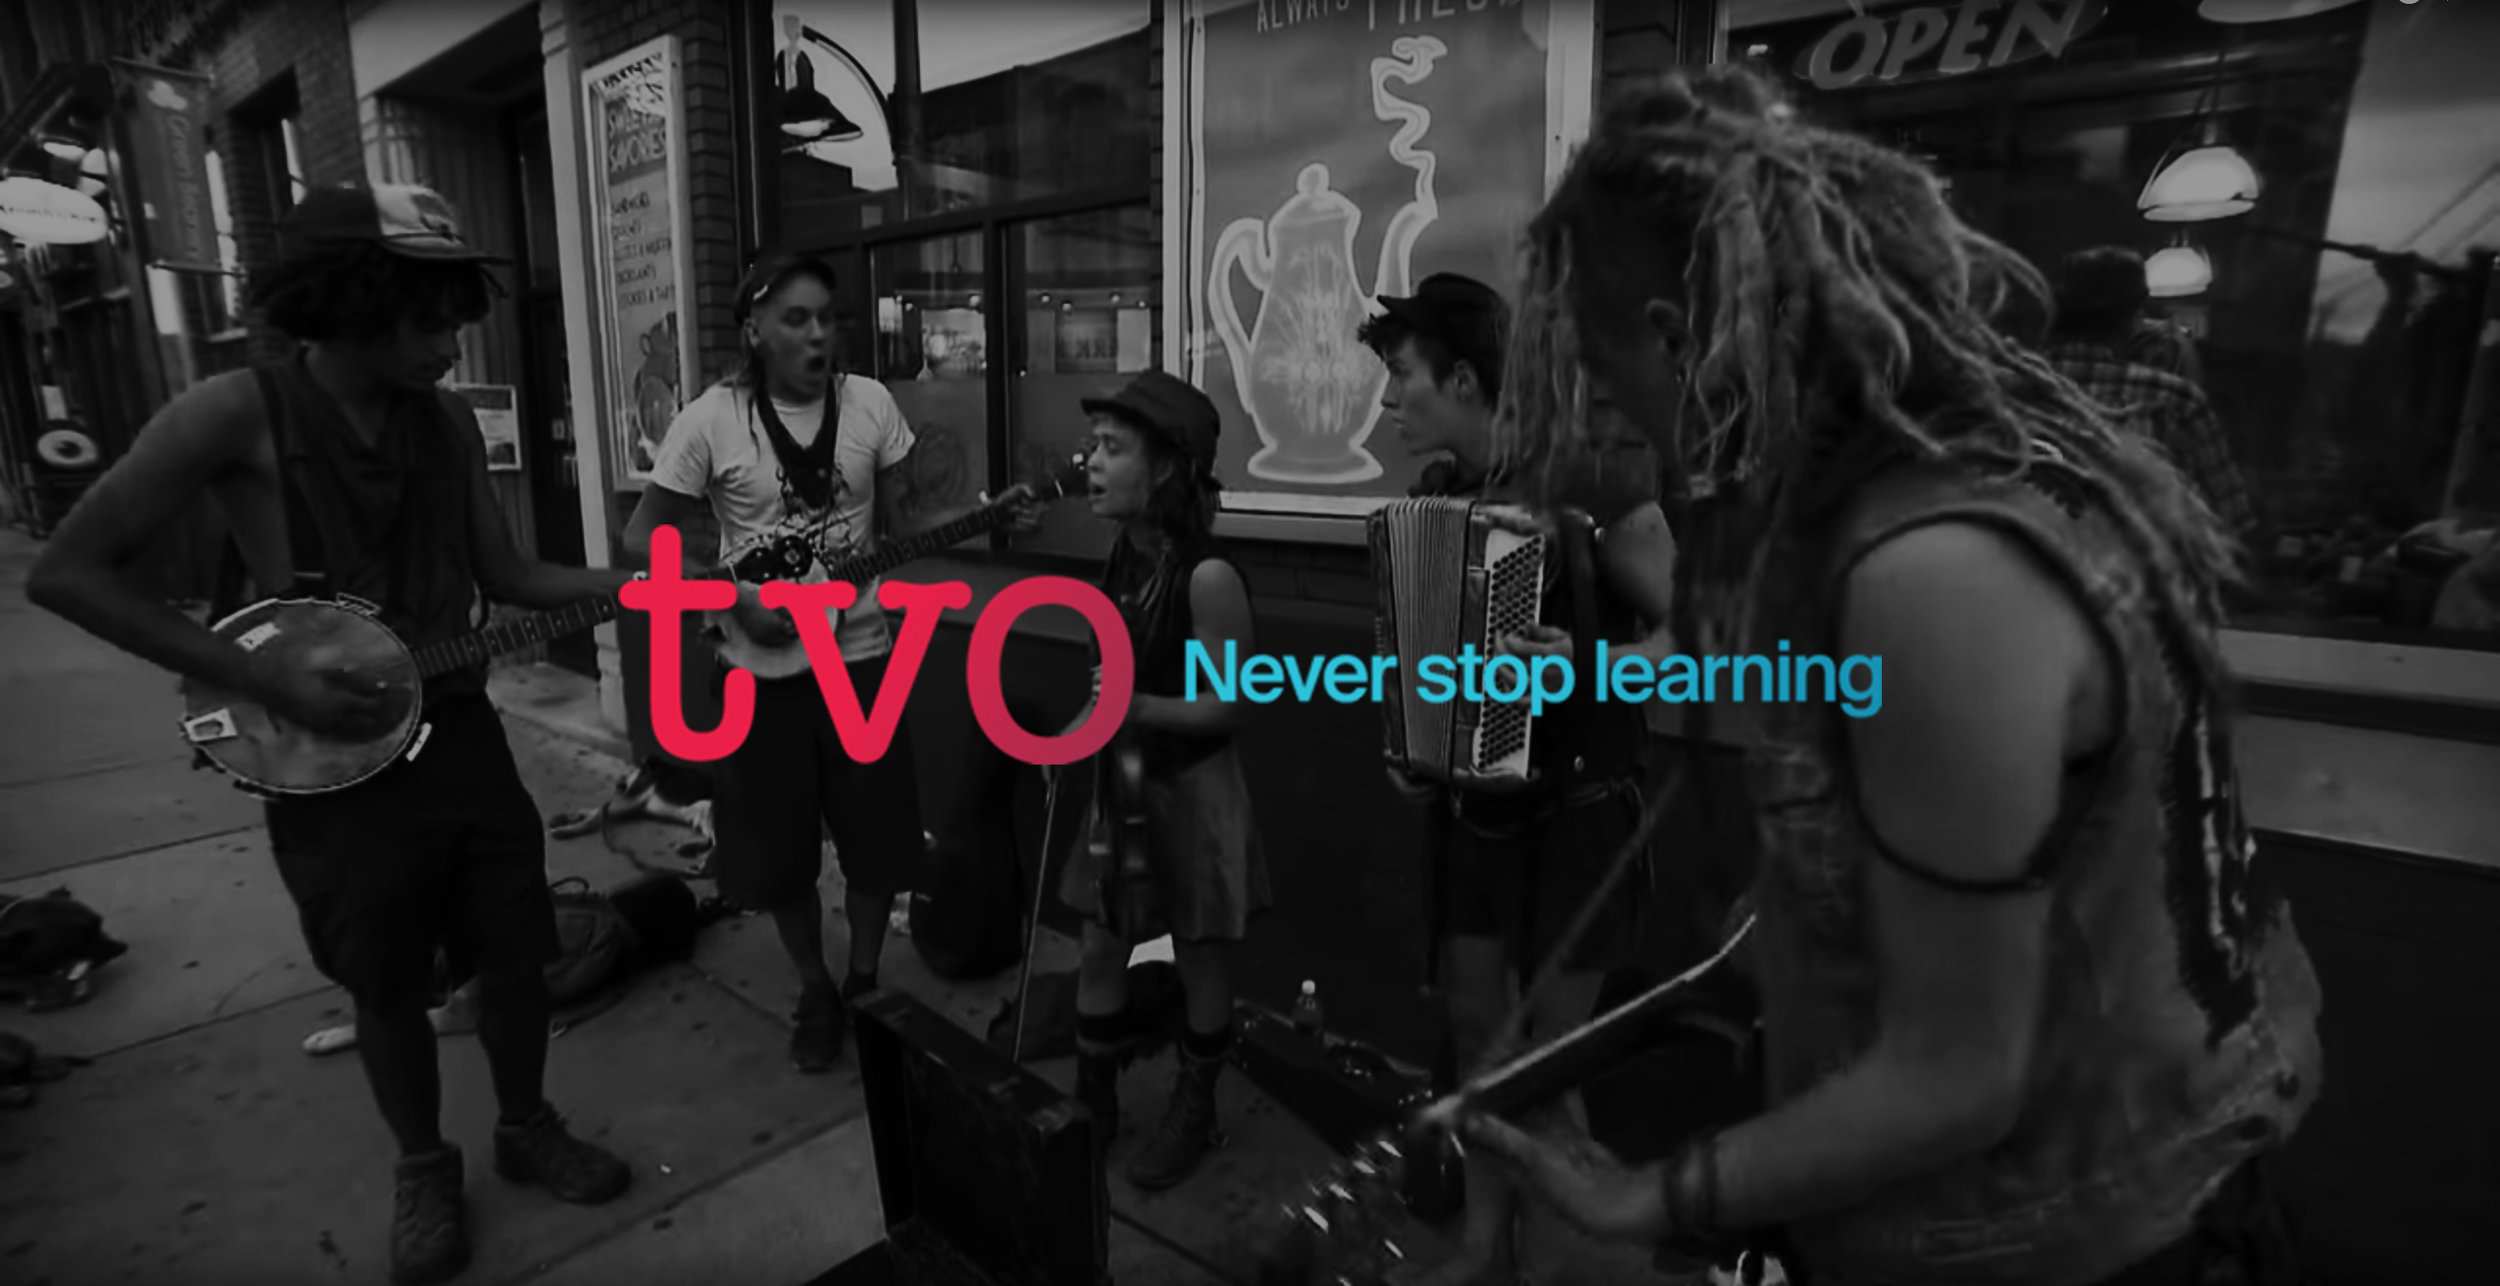 CLICK THE IMAGE TO GO TO TVO.CA